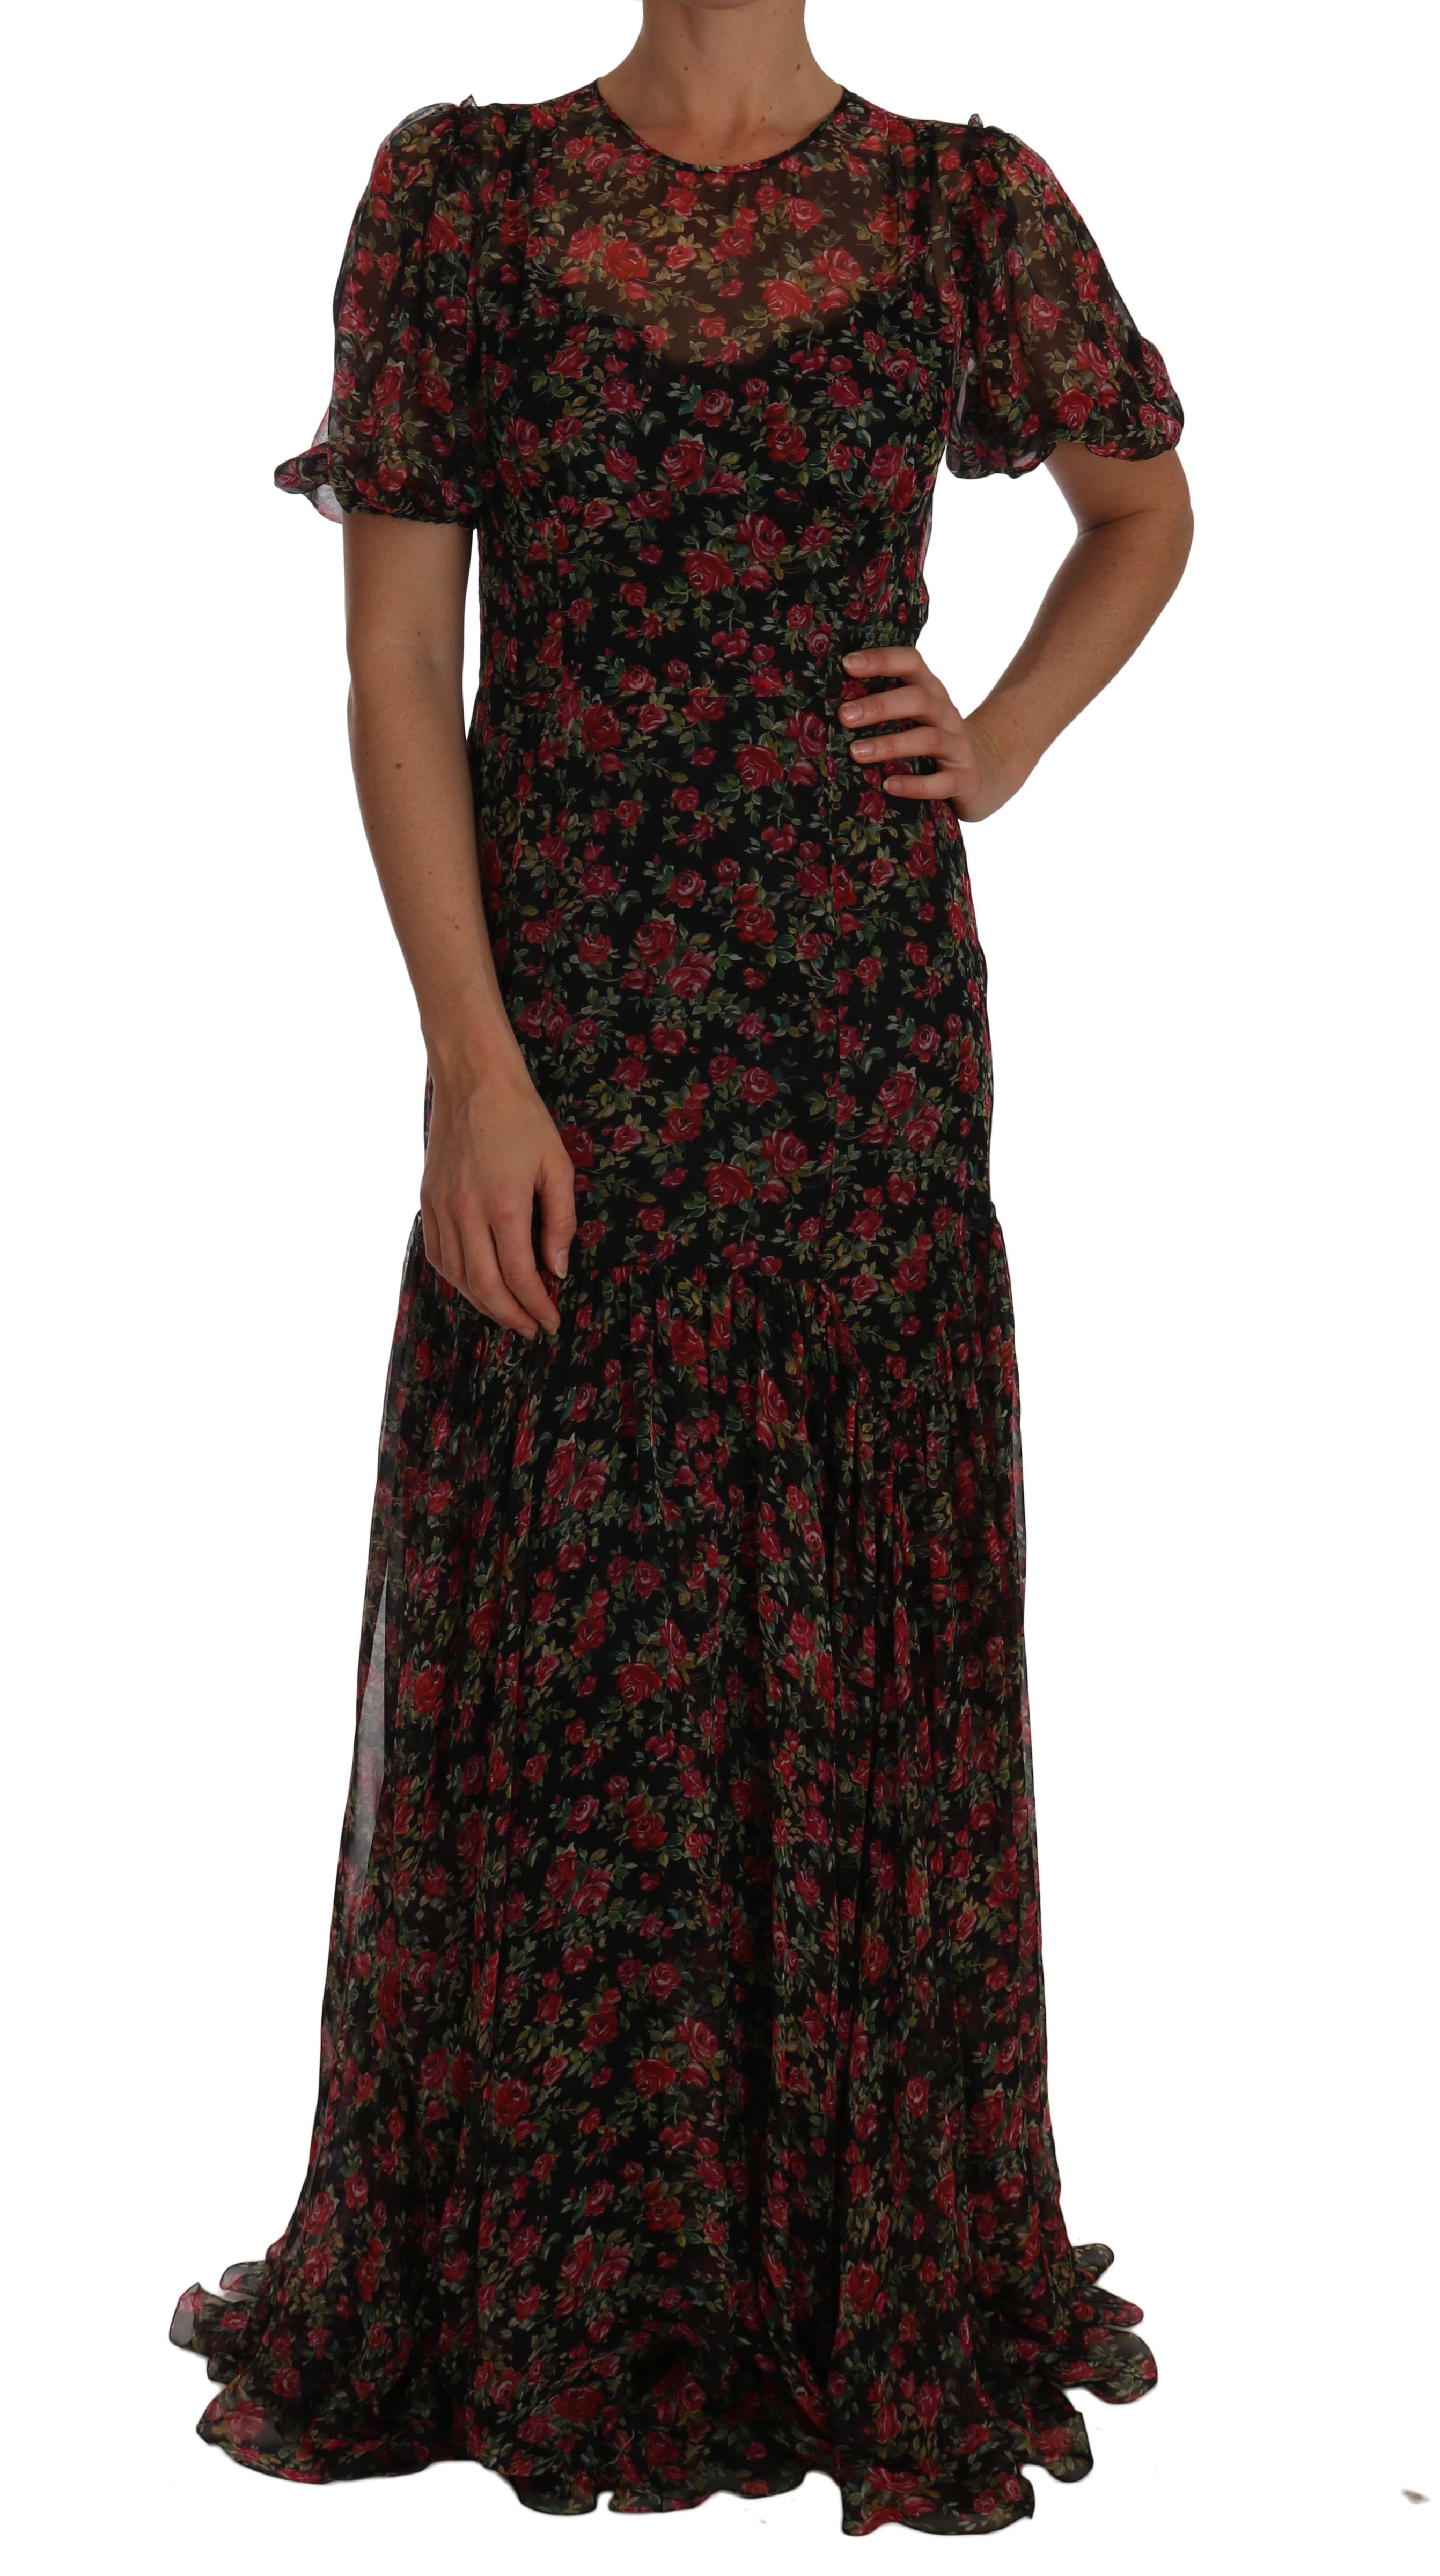 Dolce & Gabbana Women's Floral Roses A-Line Shift Gown Black DR1449 - IT40 S